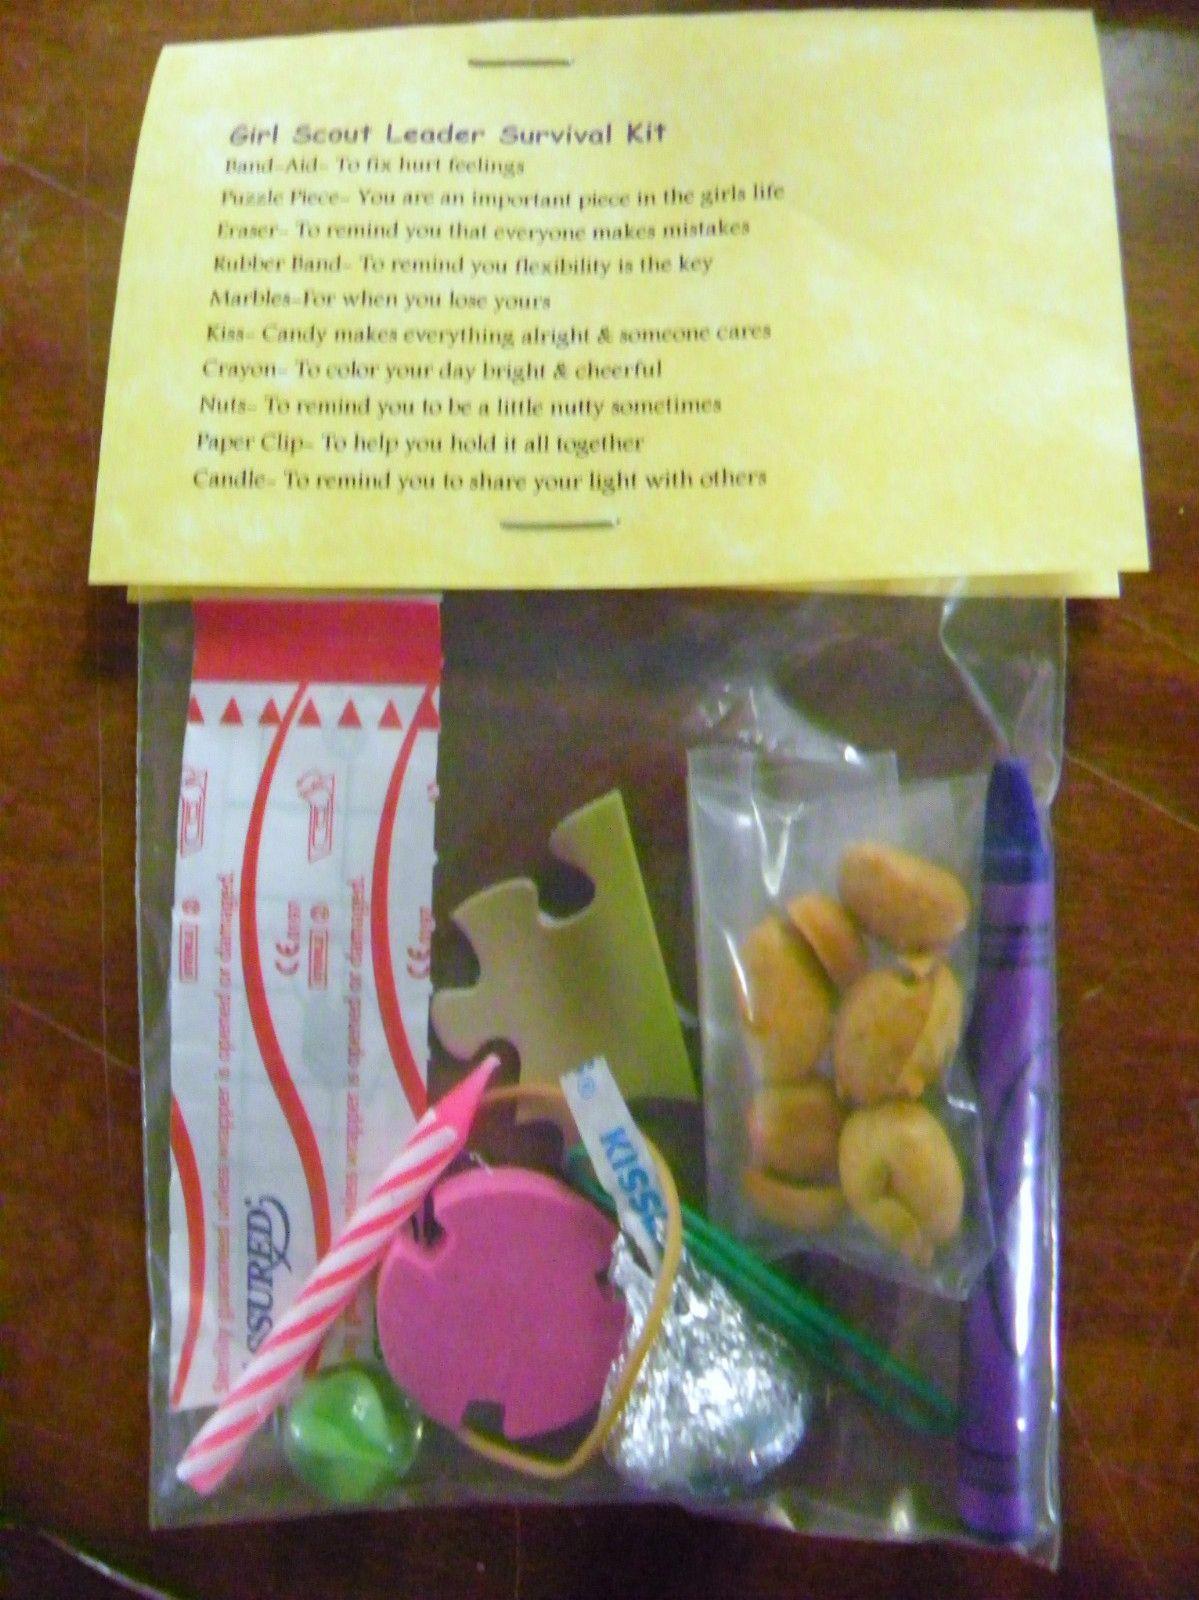 Girl Scout Leader Survival Kit 10 Items Inside Novelty